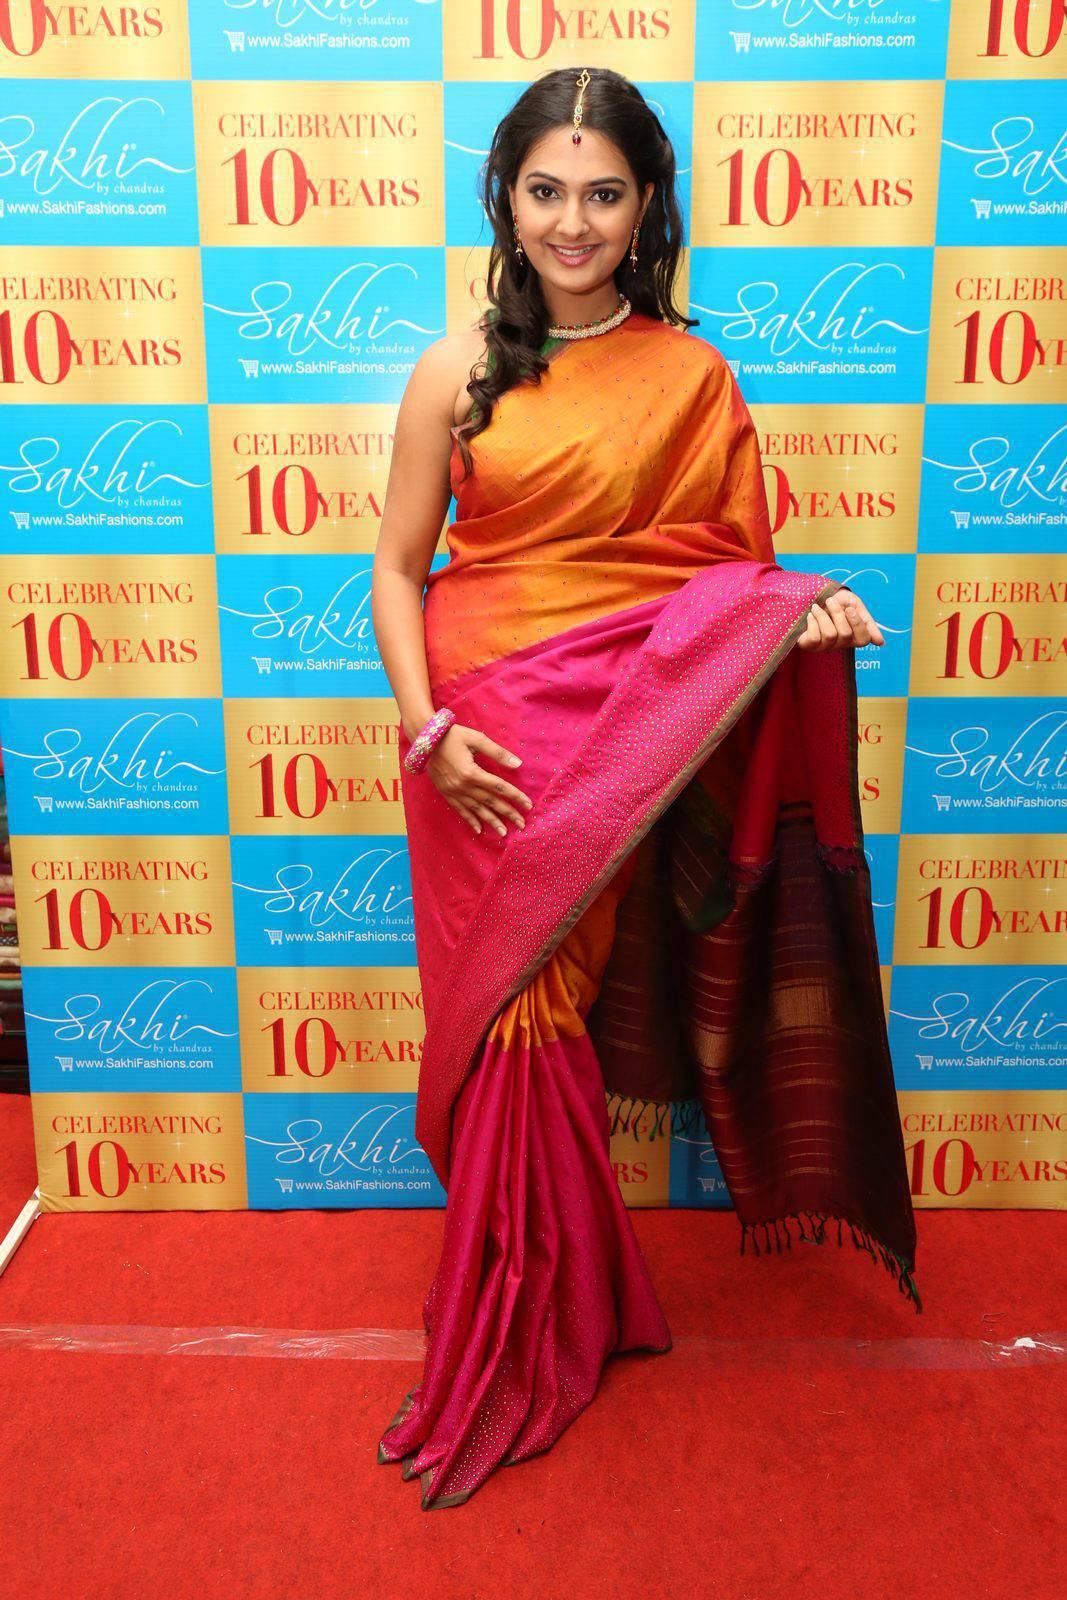 South Indian Actress Neha Deshpande Hip Navel In Traditional Orange Saree